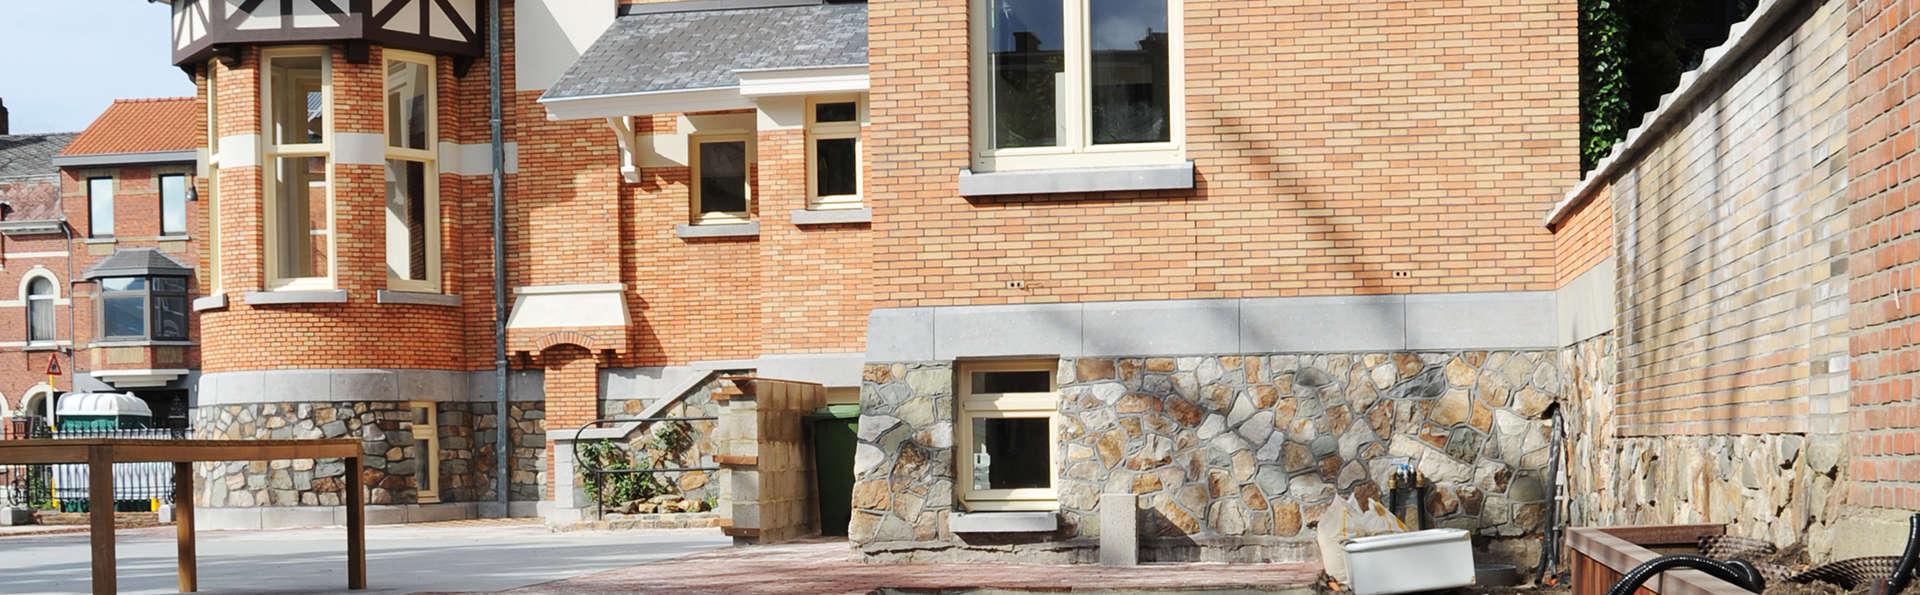 Charmehotel Villa Saporis - EDIT_front1.jpg